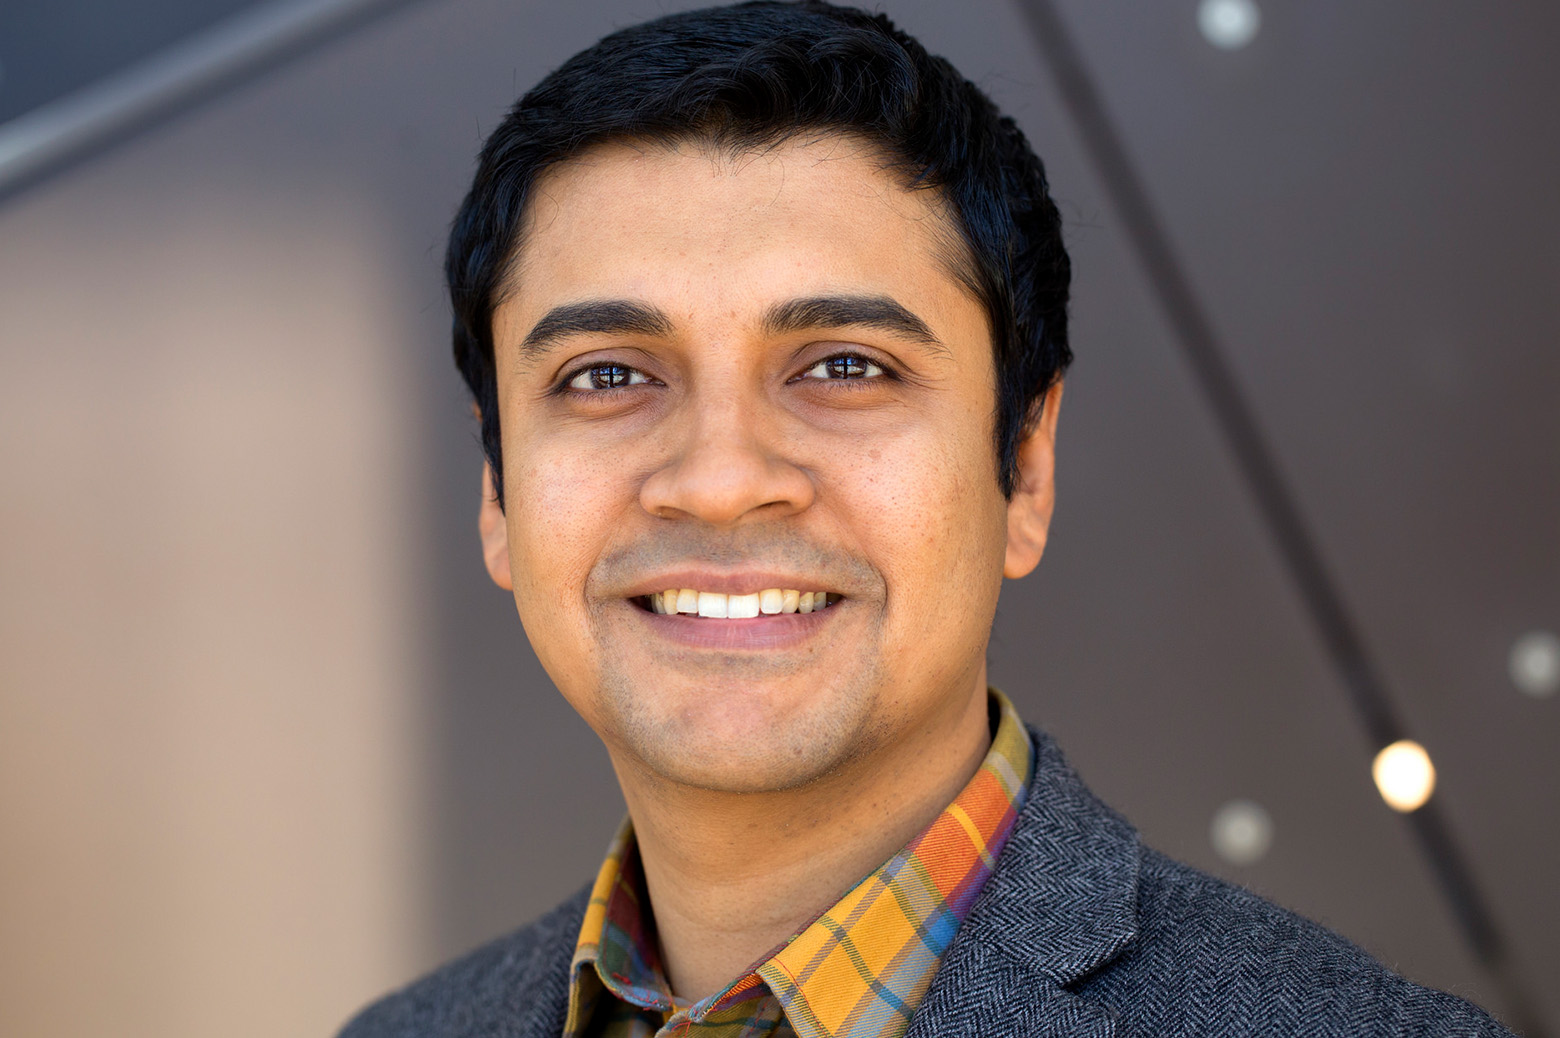 Prof. Mosharaf Chowdhury